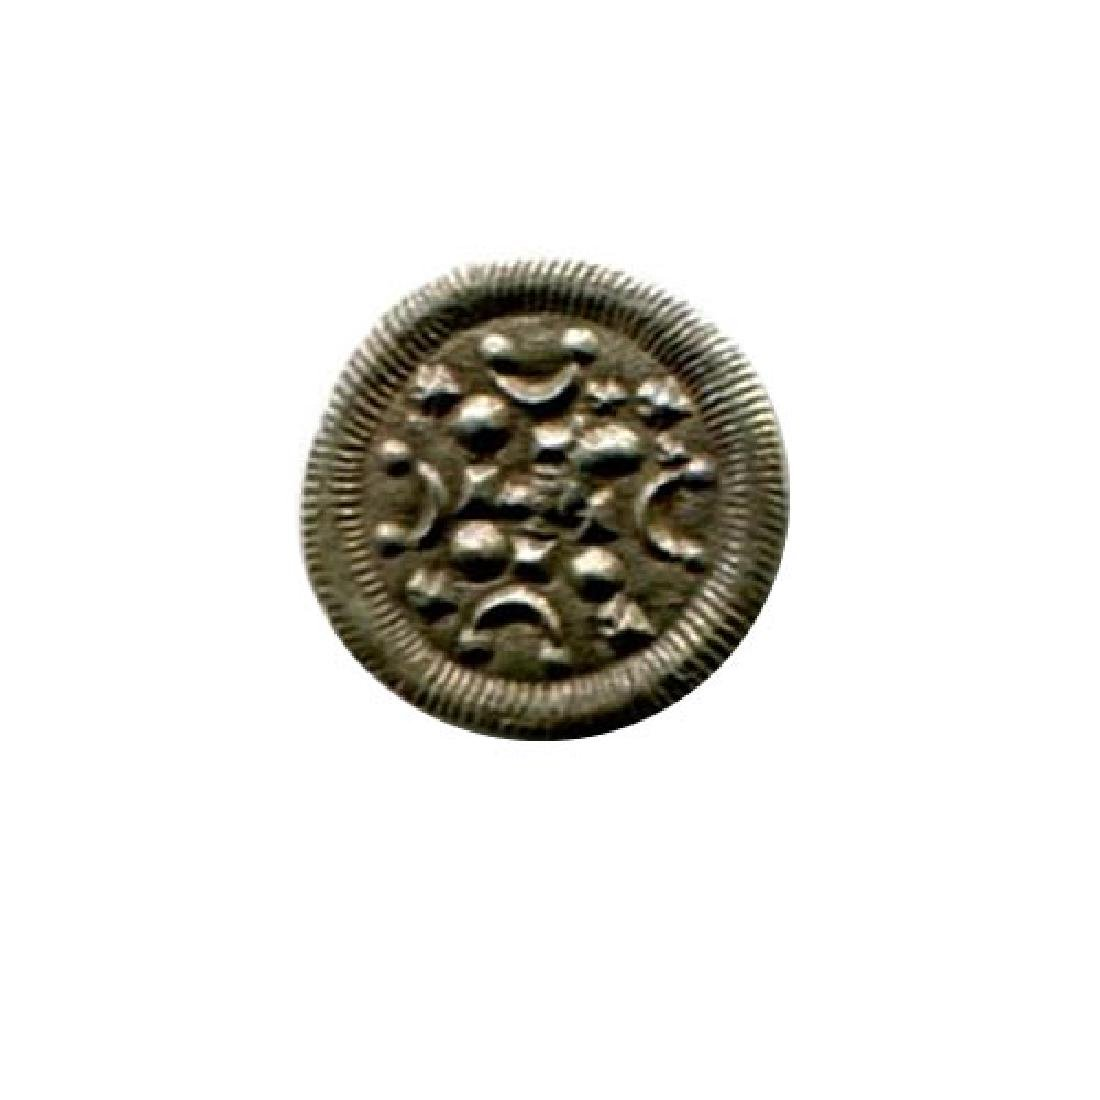 Hungary silver denar Bela II A.D. 1131-1141 Huszar#89